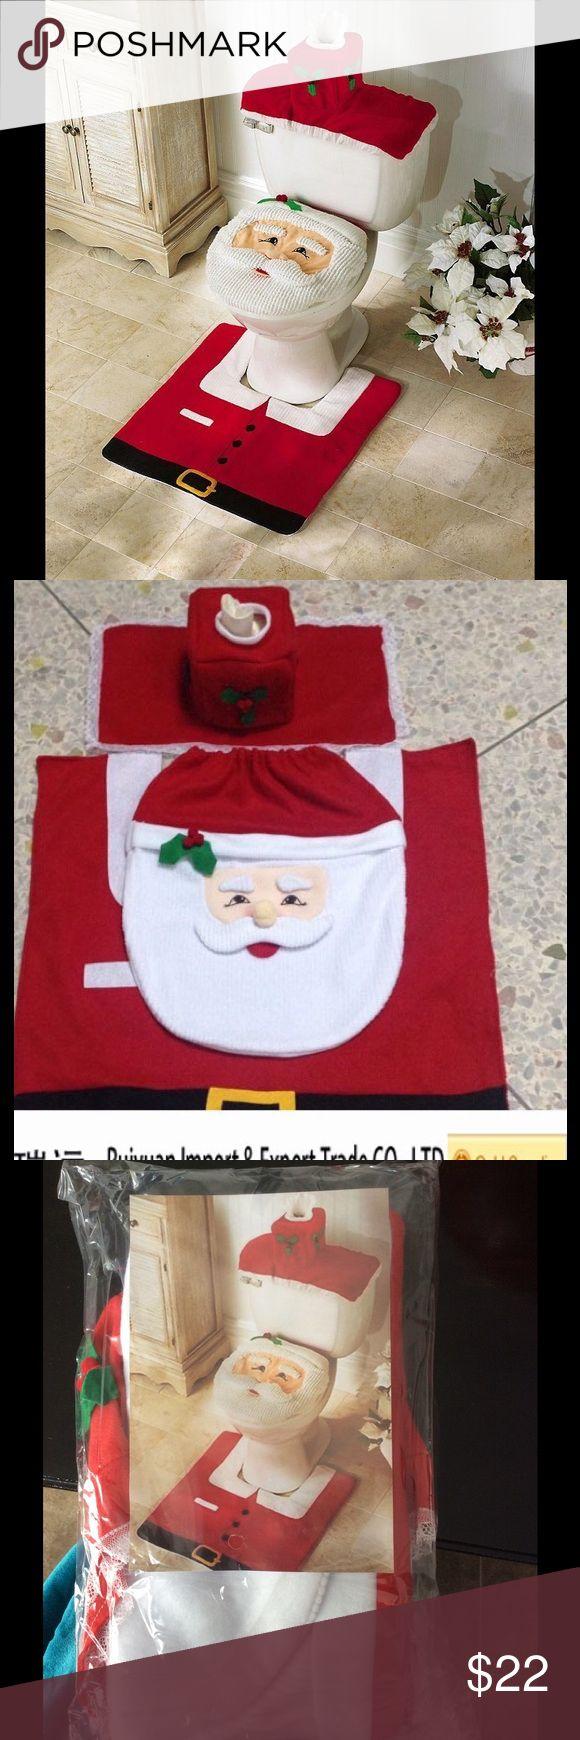 New⛄️ Santa toilet seat & Rug Set 3 Pcs Happy Santa Toilet Seat Cover and Rug Bathroom Set                                       Toilet Seat Cover Size: 43 x 35.5cm  Rug Size: 55 x 55cm  Color: Red Weight: 0.27kg Other